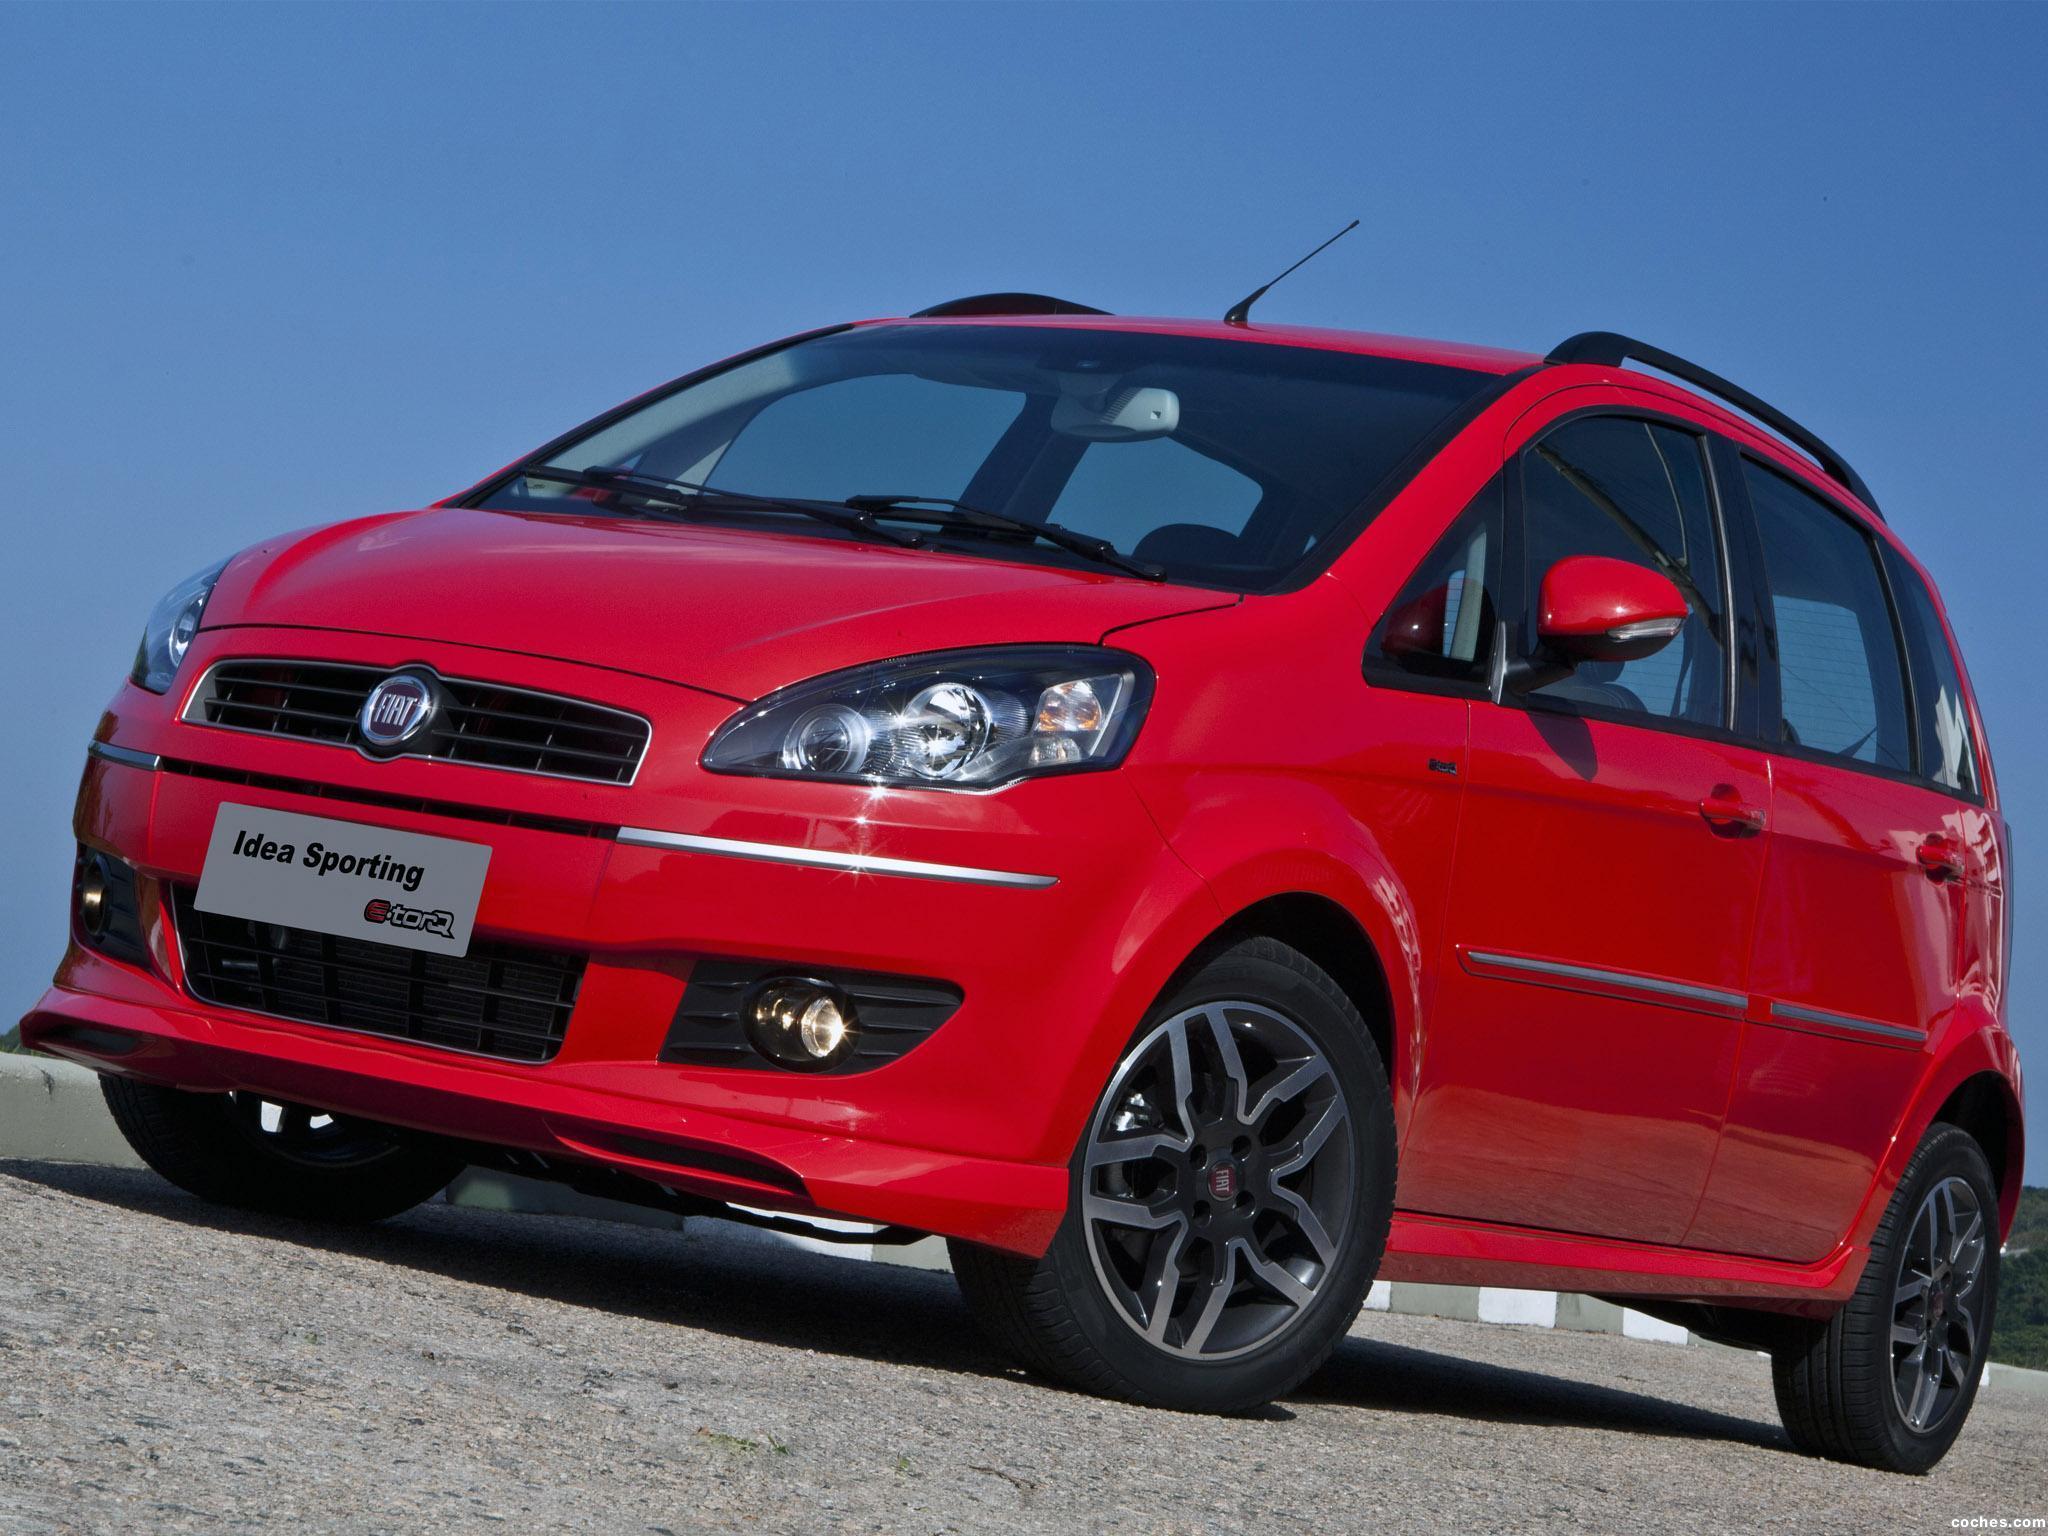 Foto 1 de Fiat Idea Sporting 2010